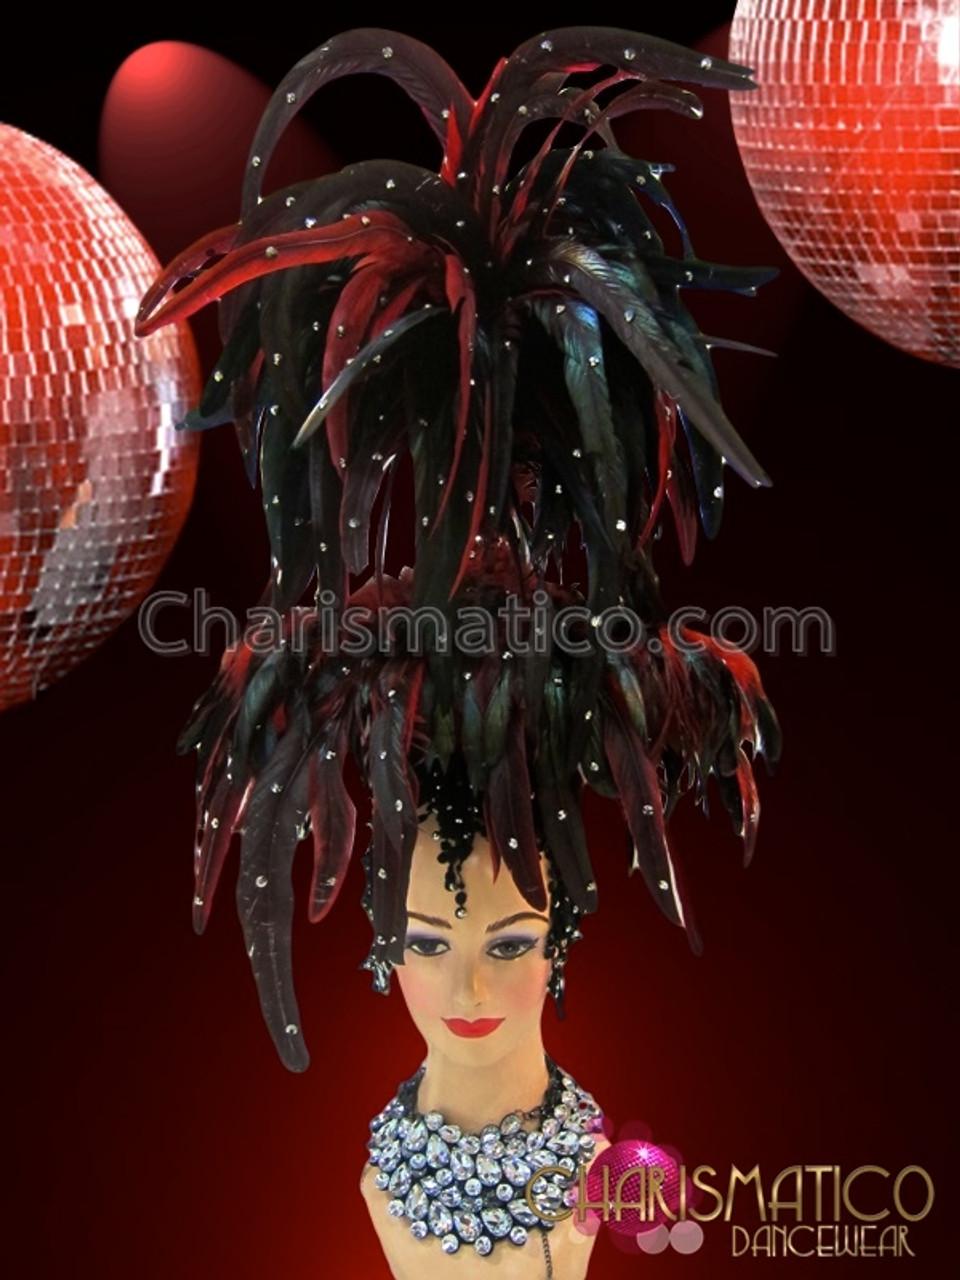 Charismatico Silver Black BUTTERFLY STUNNING DRAG QUEEN DIVA Headdress